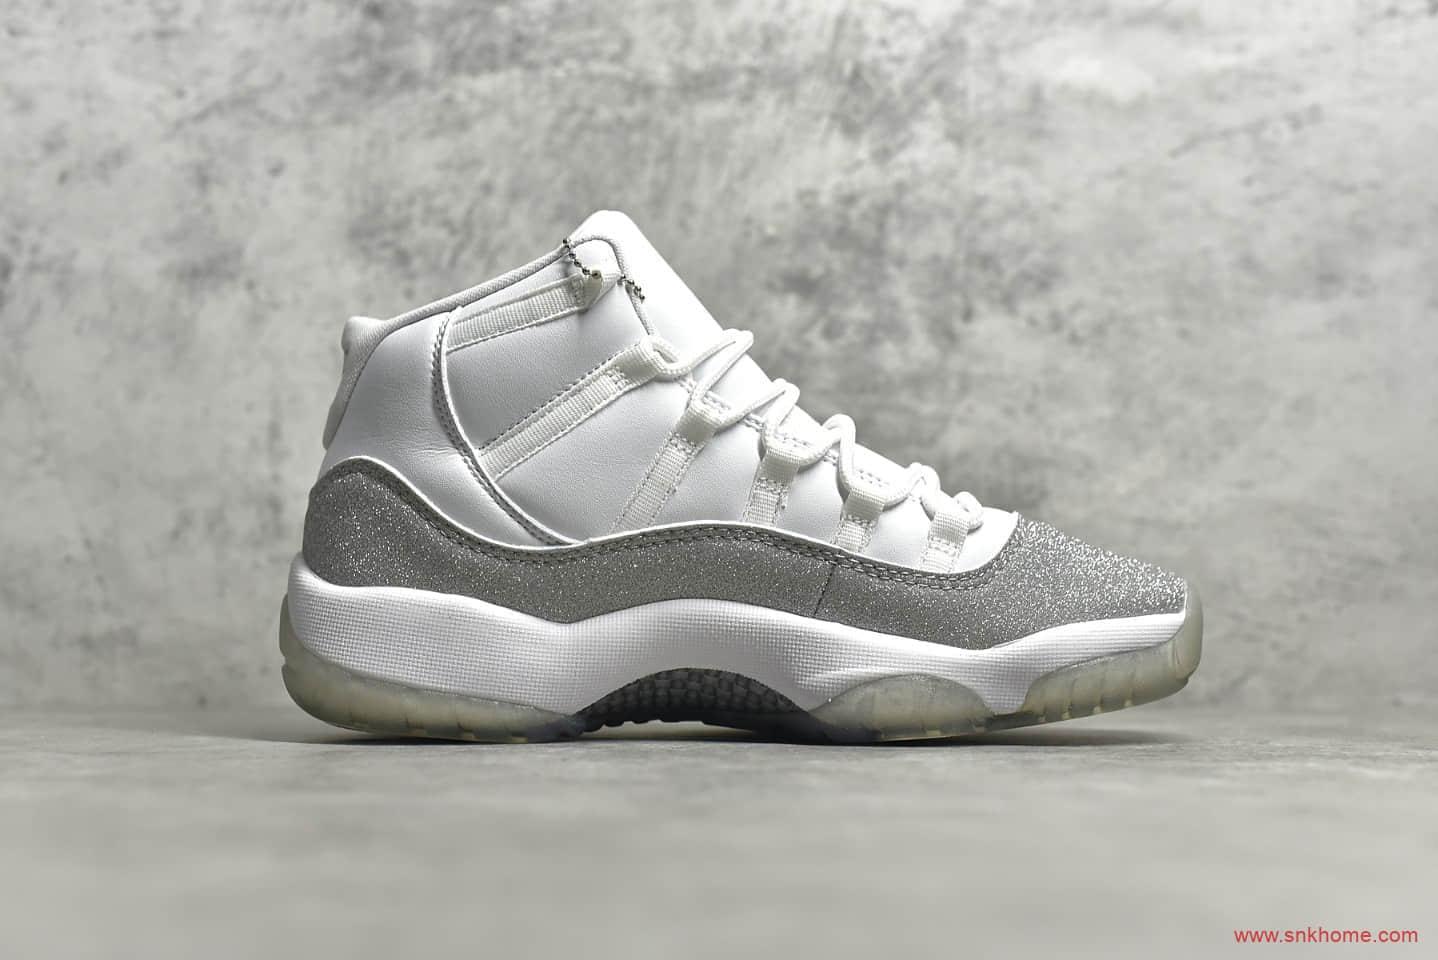 AJ11满天星婚姻球鞋Air Jordan 11 WMNS